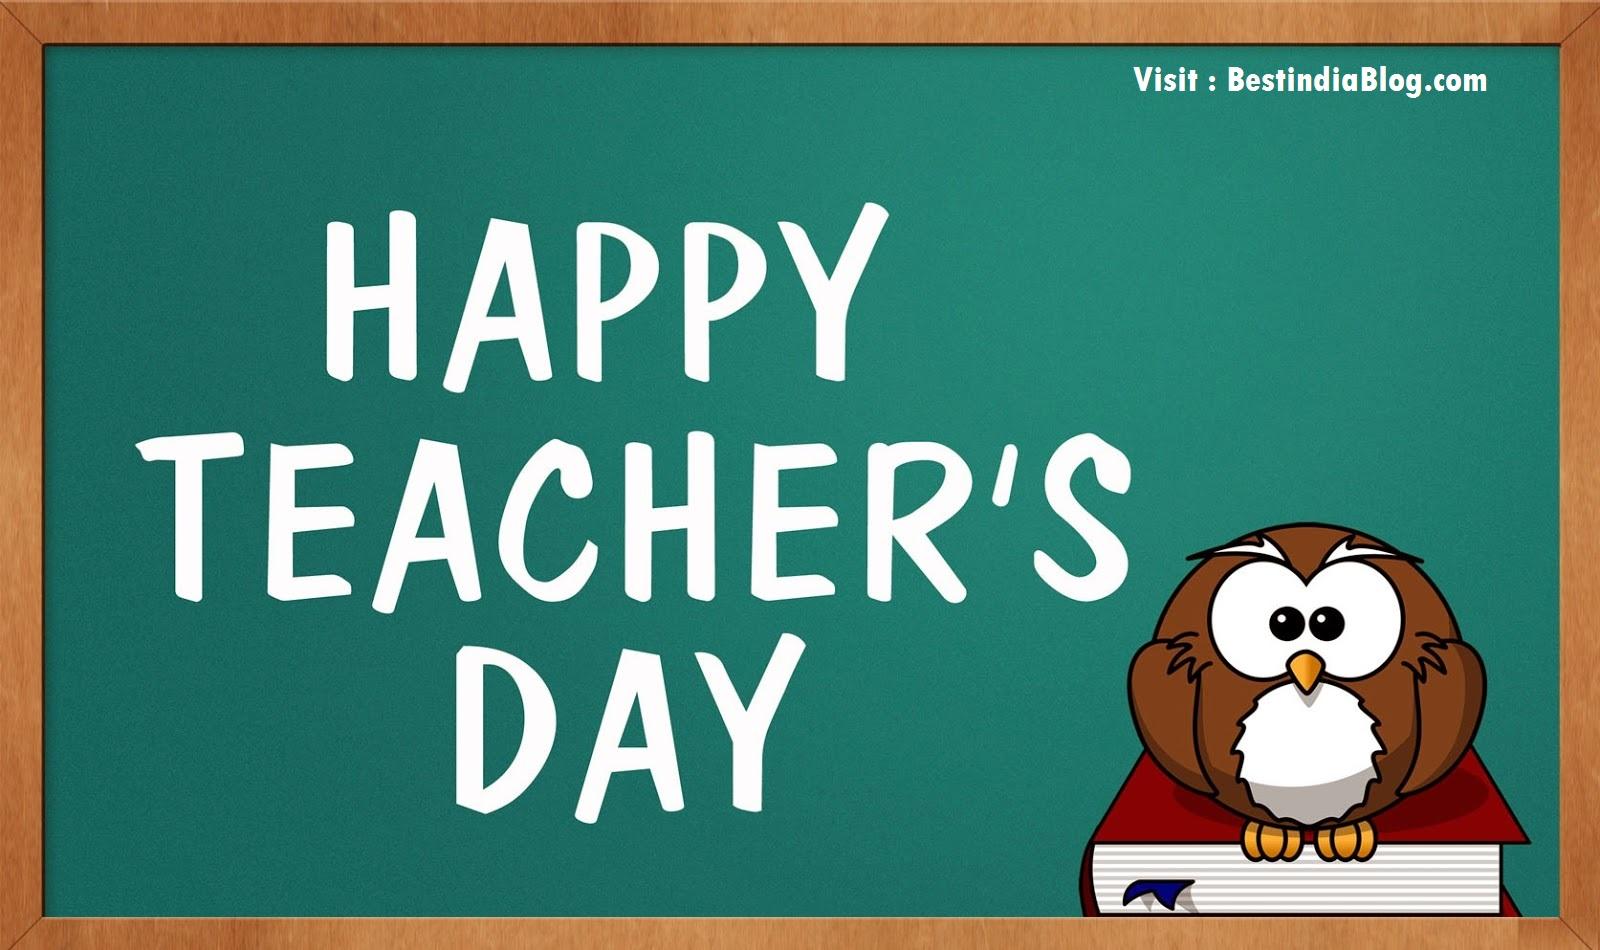 Short essay on The Teacher's Day